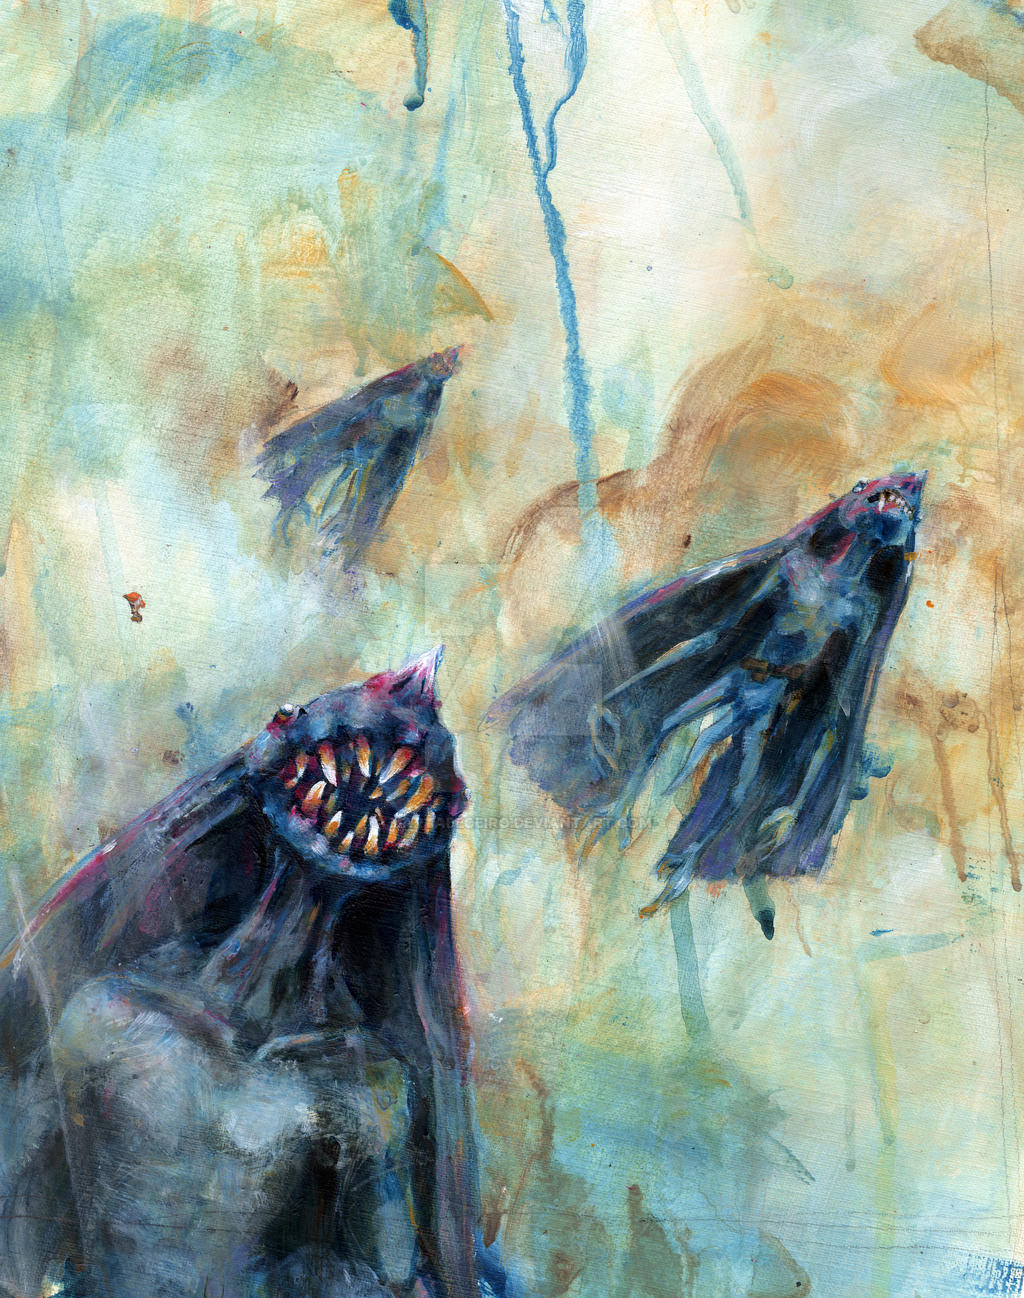 Gobats by martabeceiro